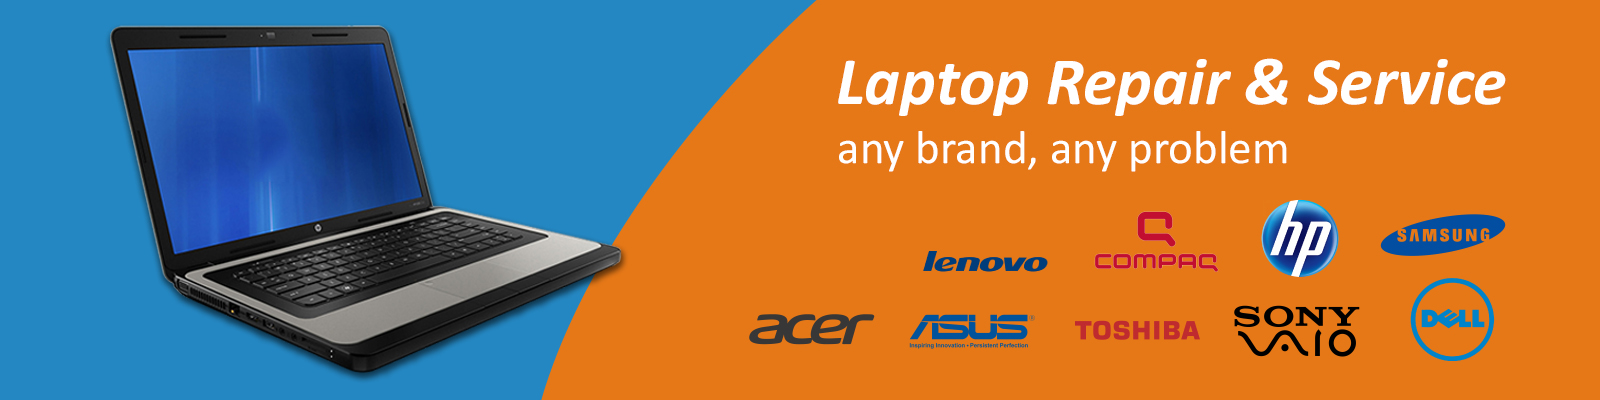 Lenovo Laptop Service Center in FaridabadComputers and MobilesLaptop Mobiles Computer RepairingFaridabadAjit Nagar